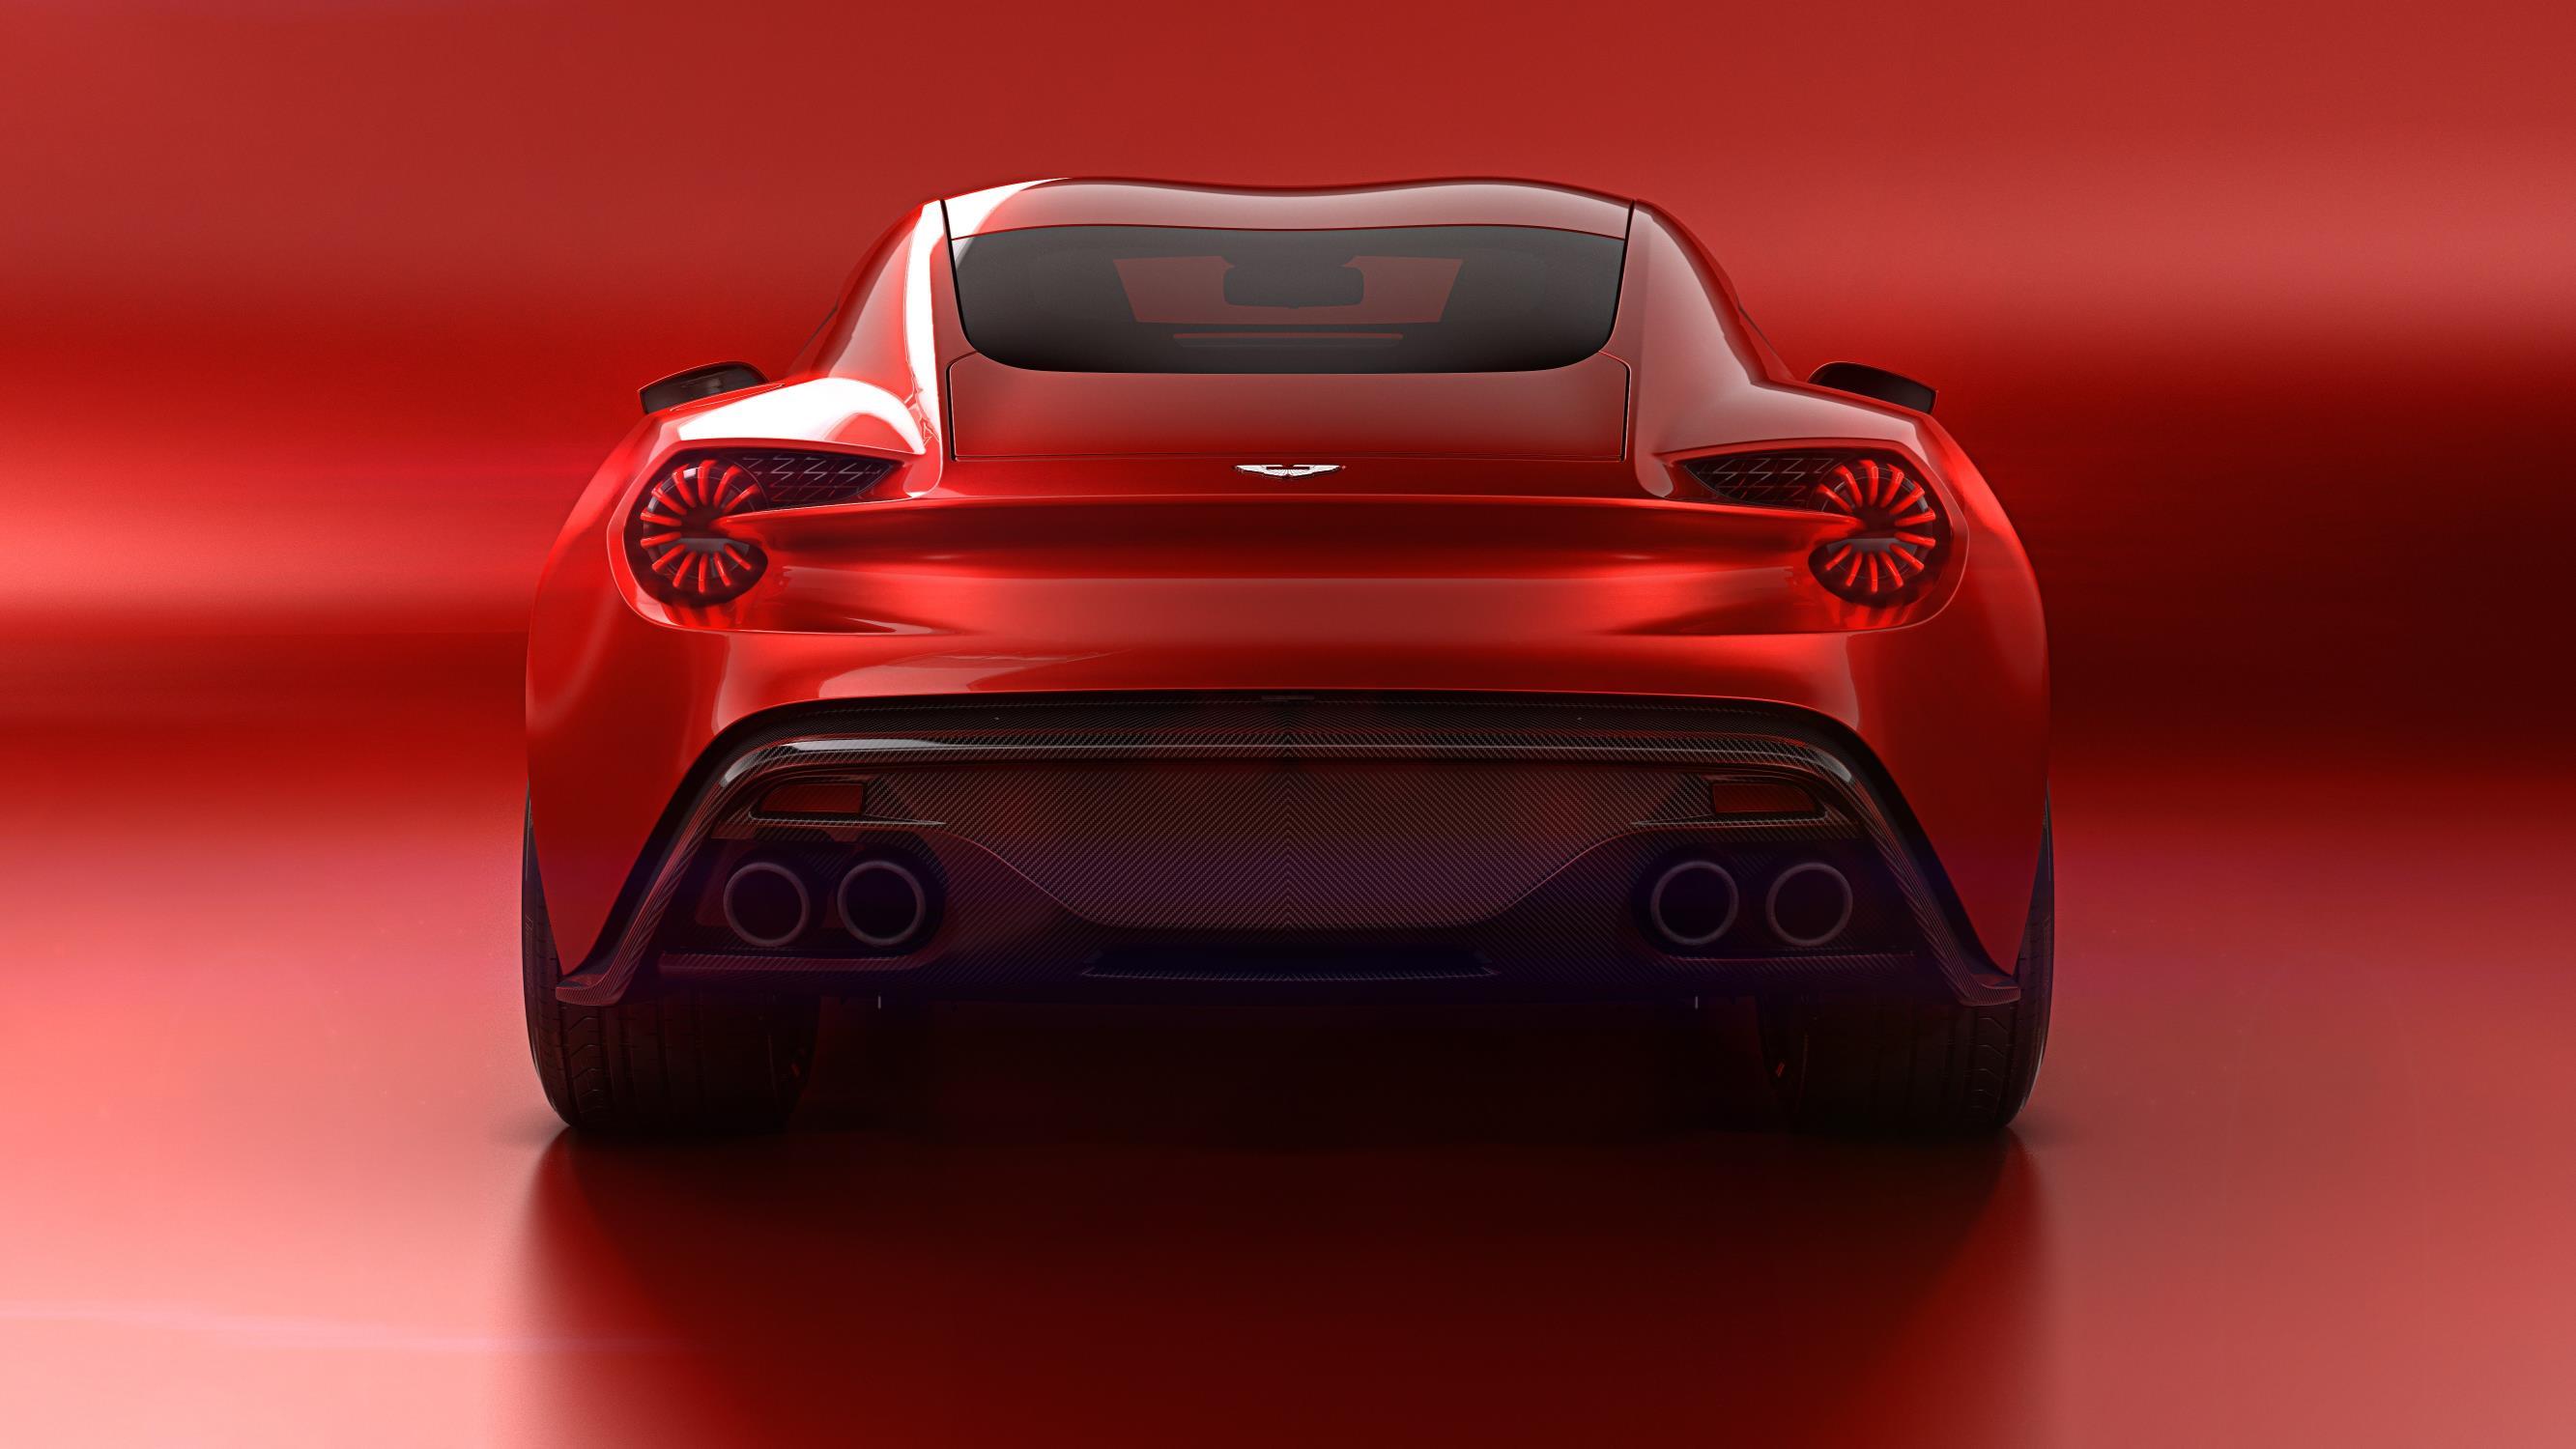 Aston Martin Vanquish Zagato Speedster Rendered As The Rumored